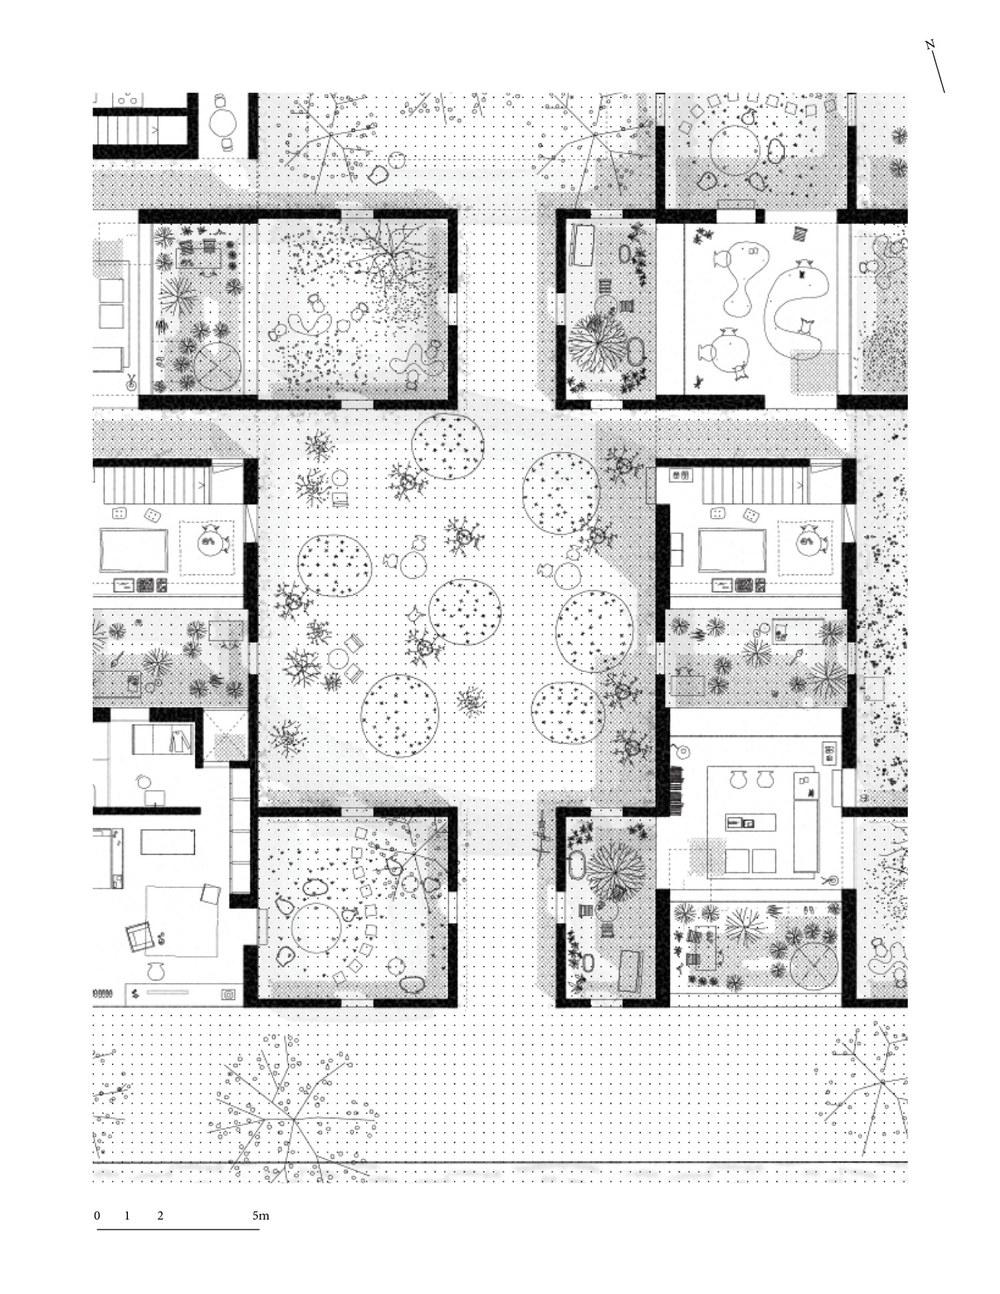 santo-santiago-houses-plan-02.jpg